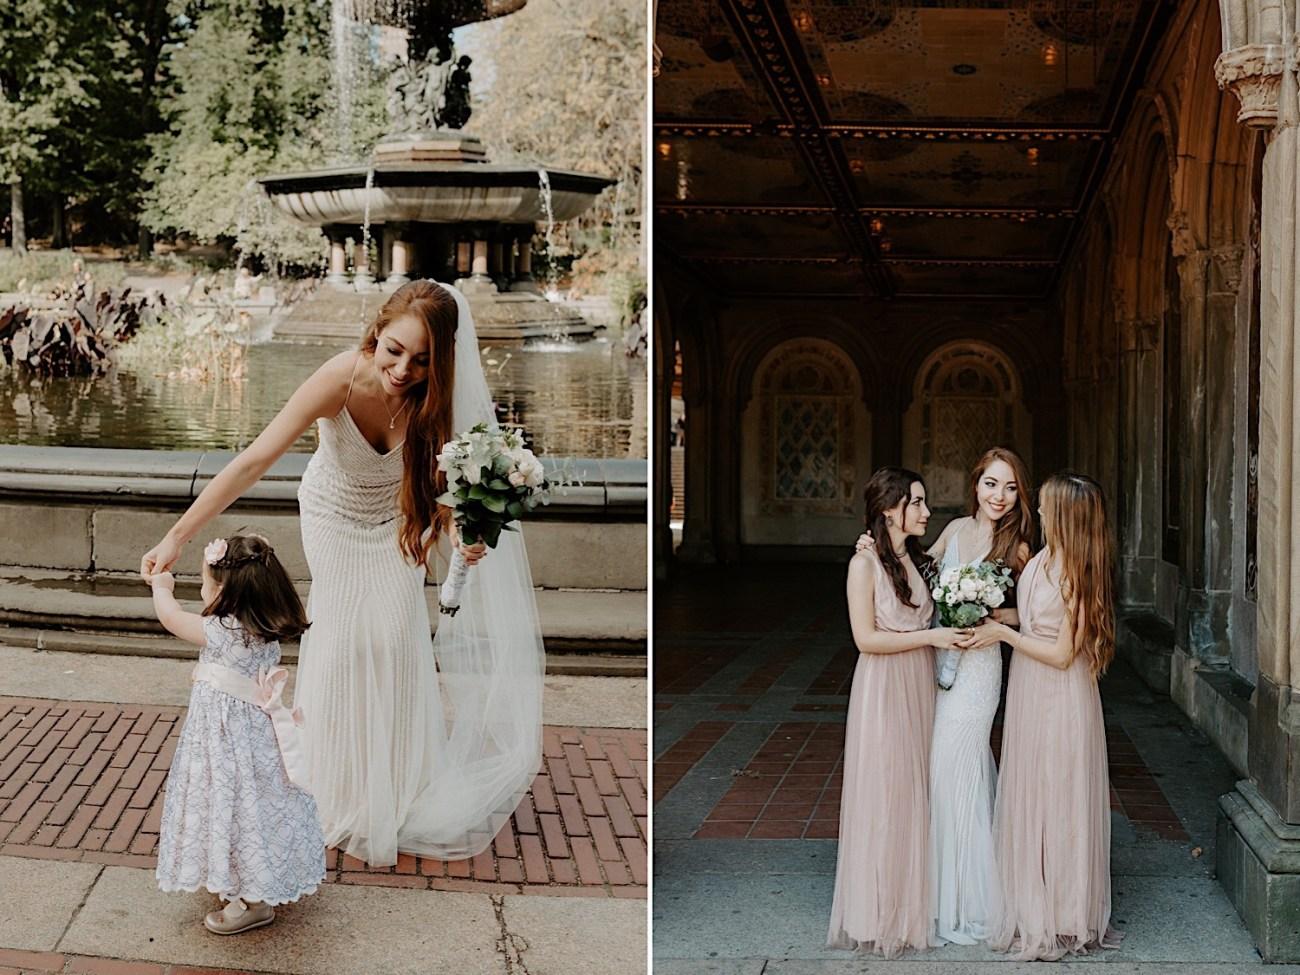 Central Park Wedding Photos Central Park Elopement NYC Wedding Photographer 44